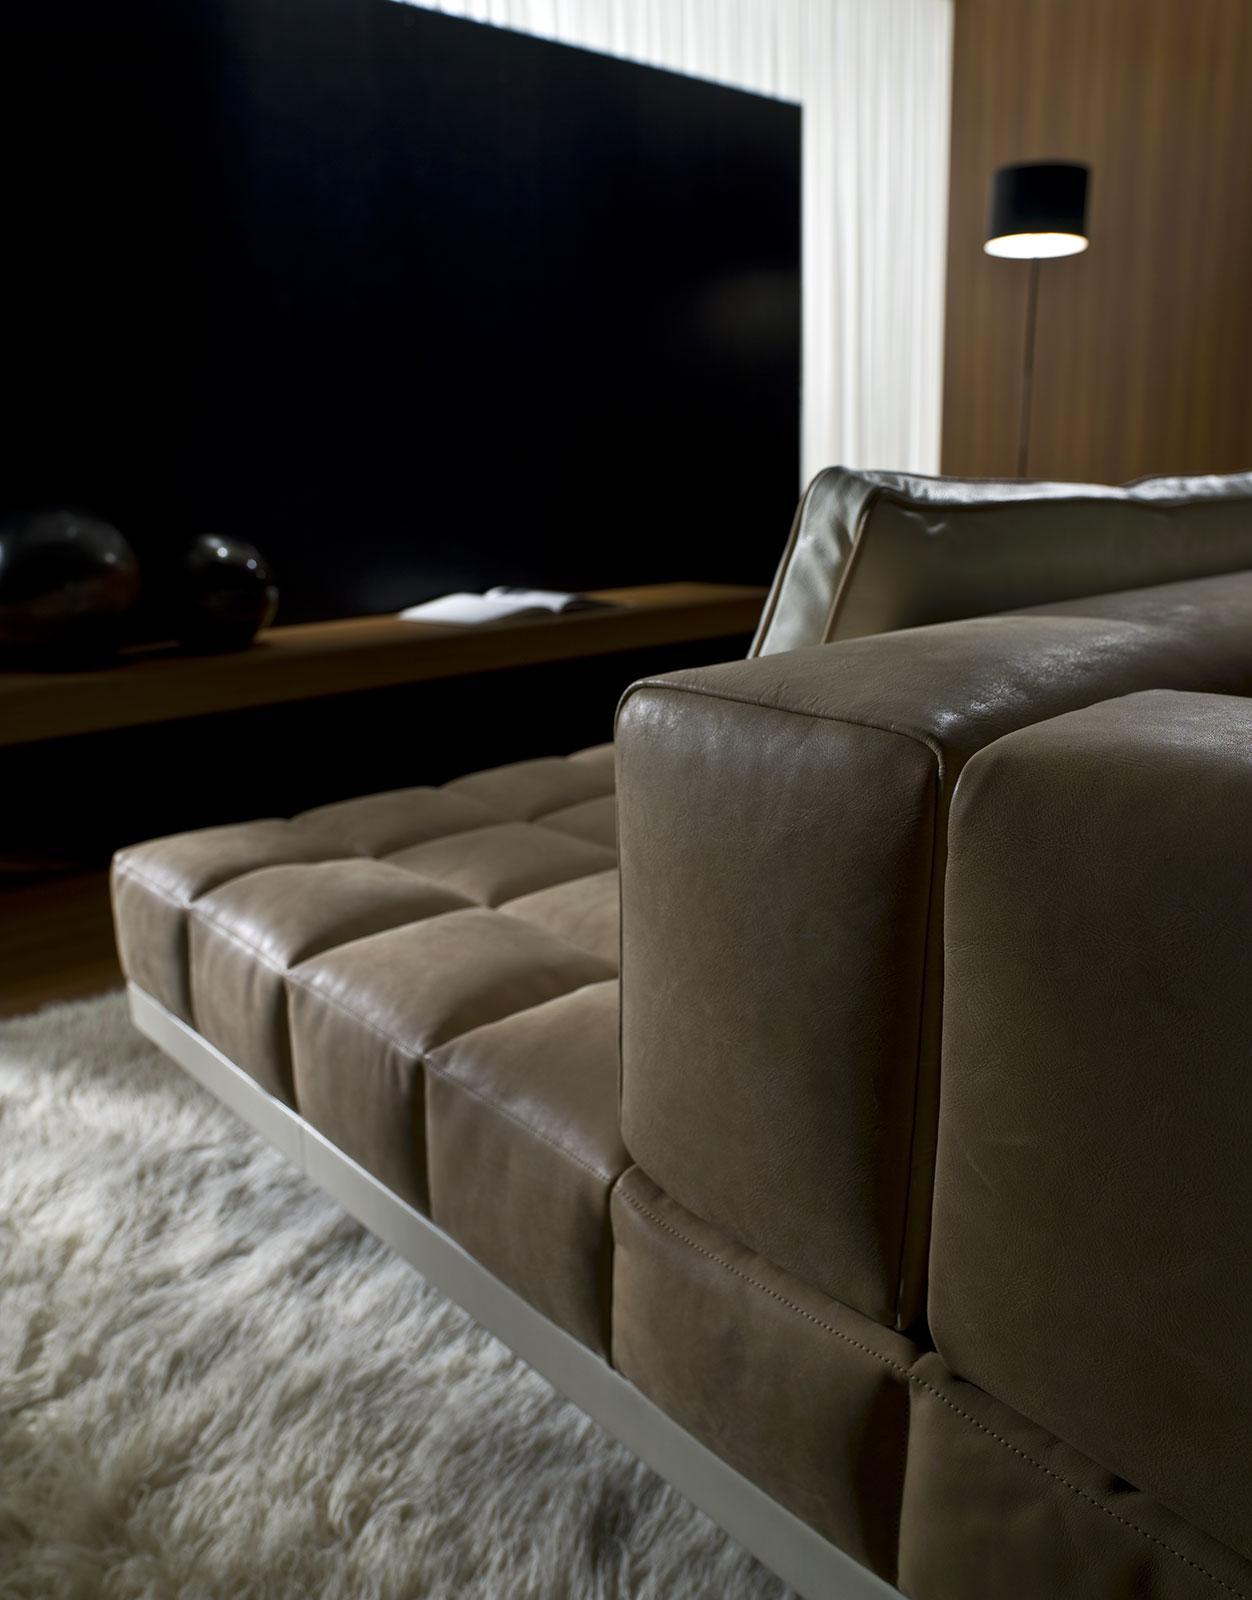 leather sofa manufacturers italy bed mattress canada insula modular shop online dream design